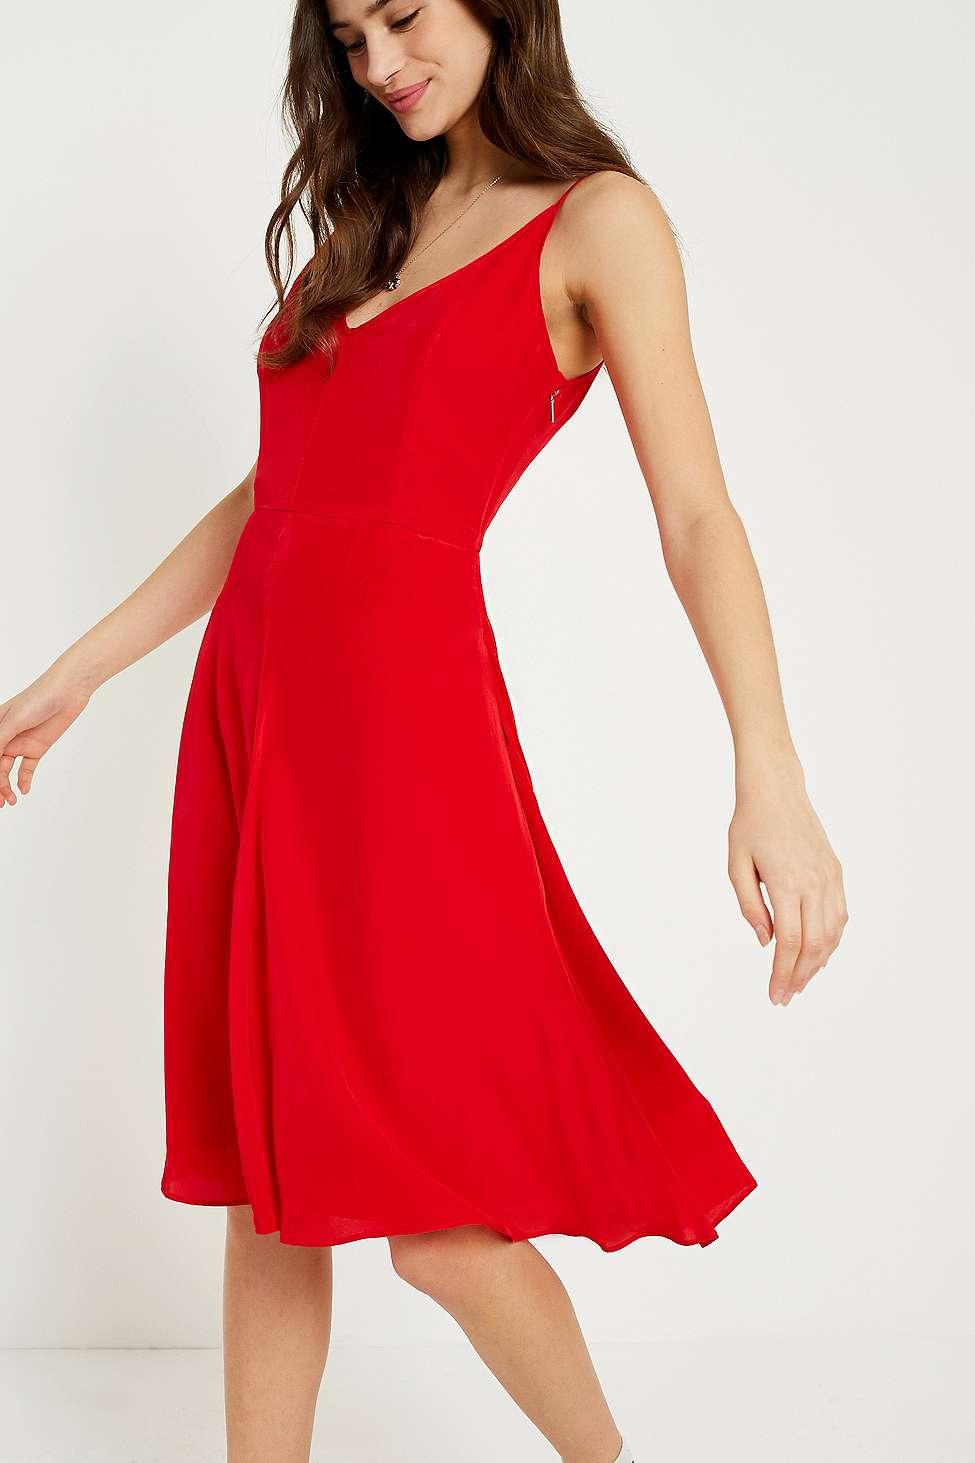 Calvin Klein Red Crepe Slip Dress, Red